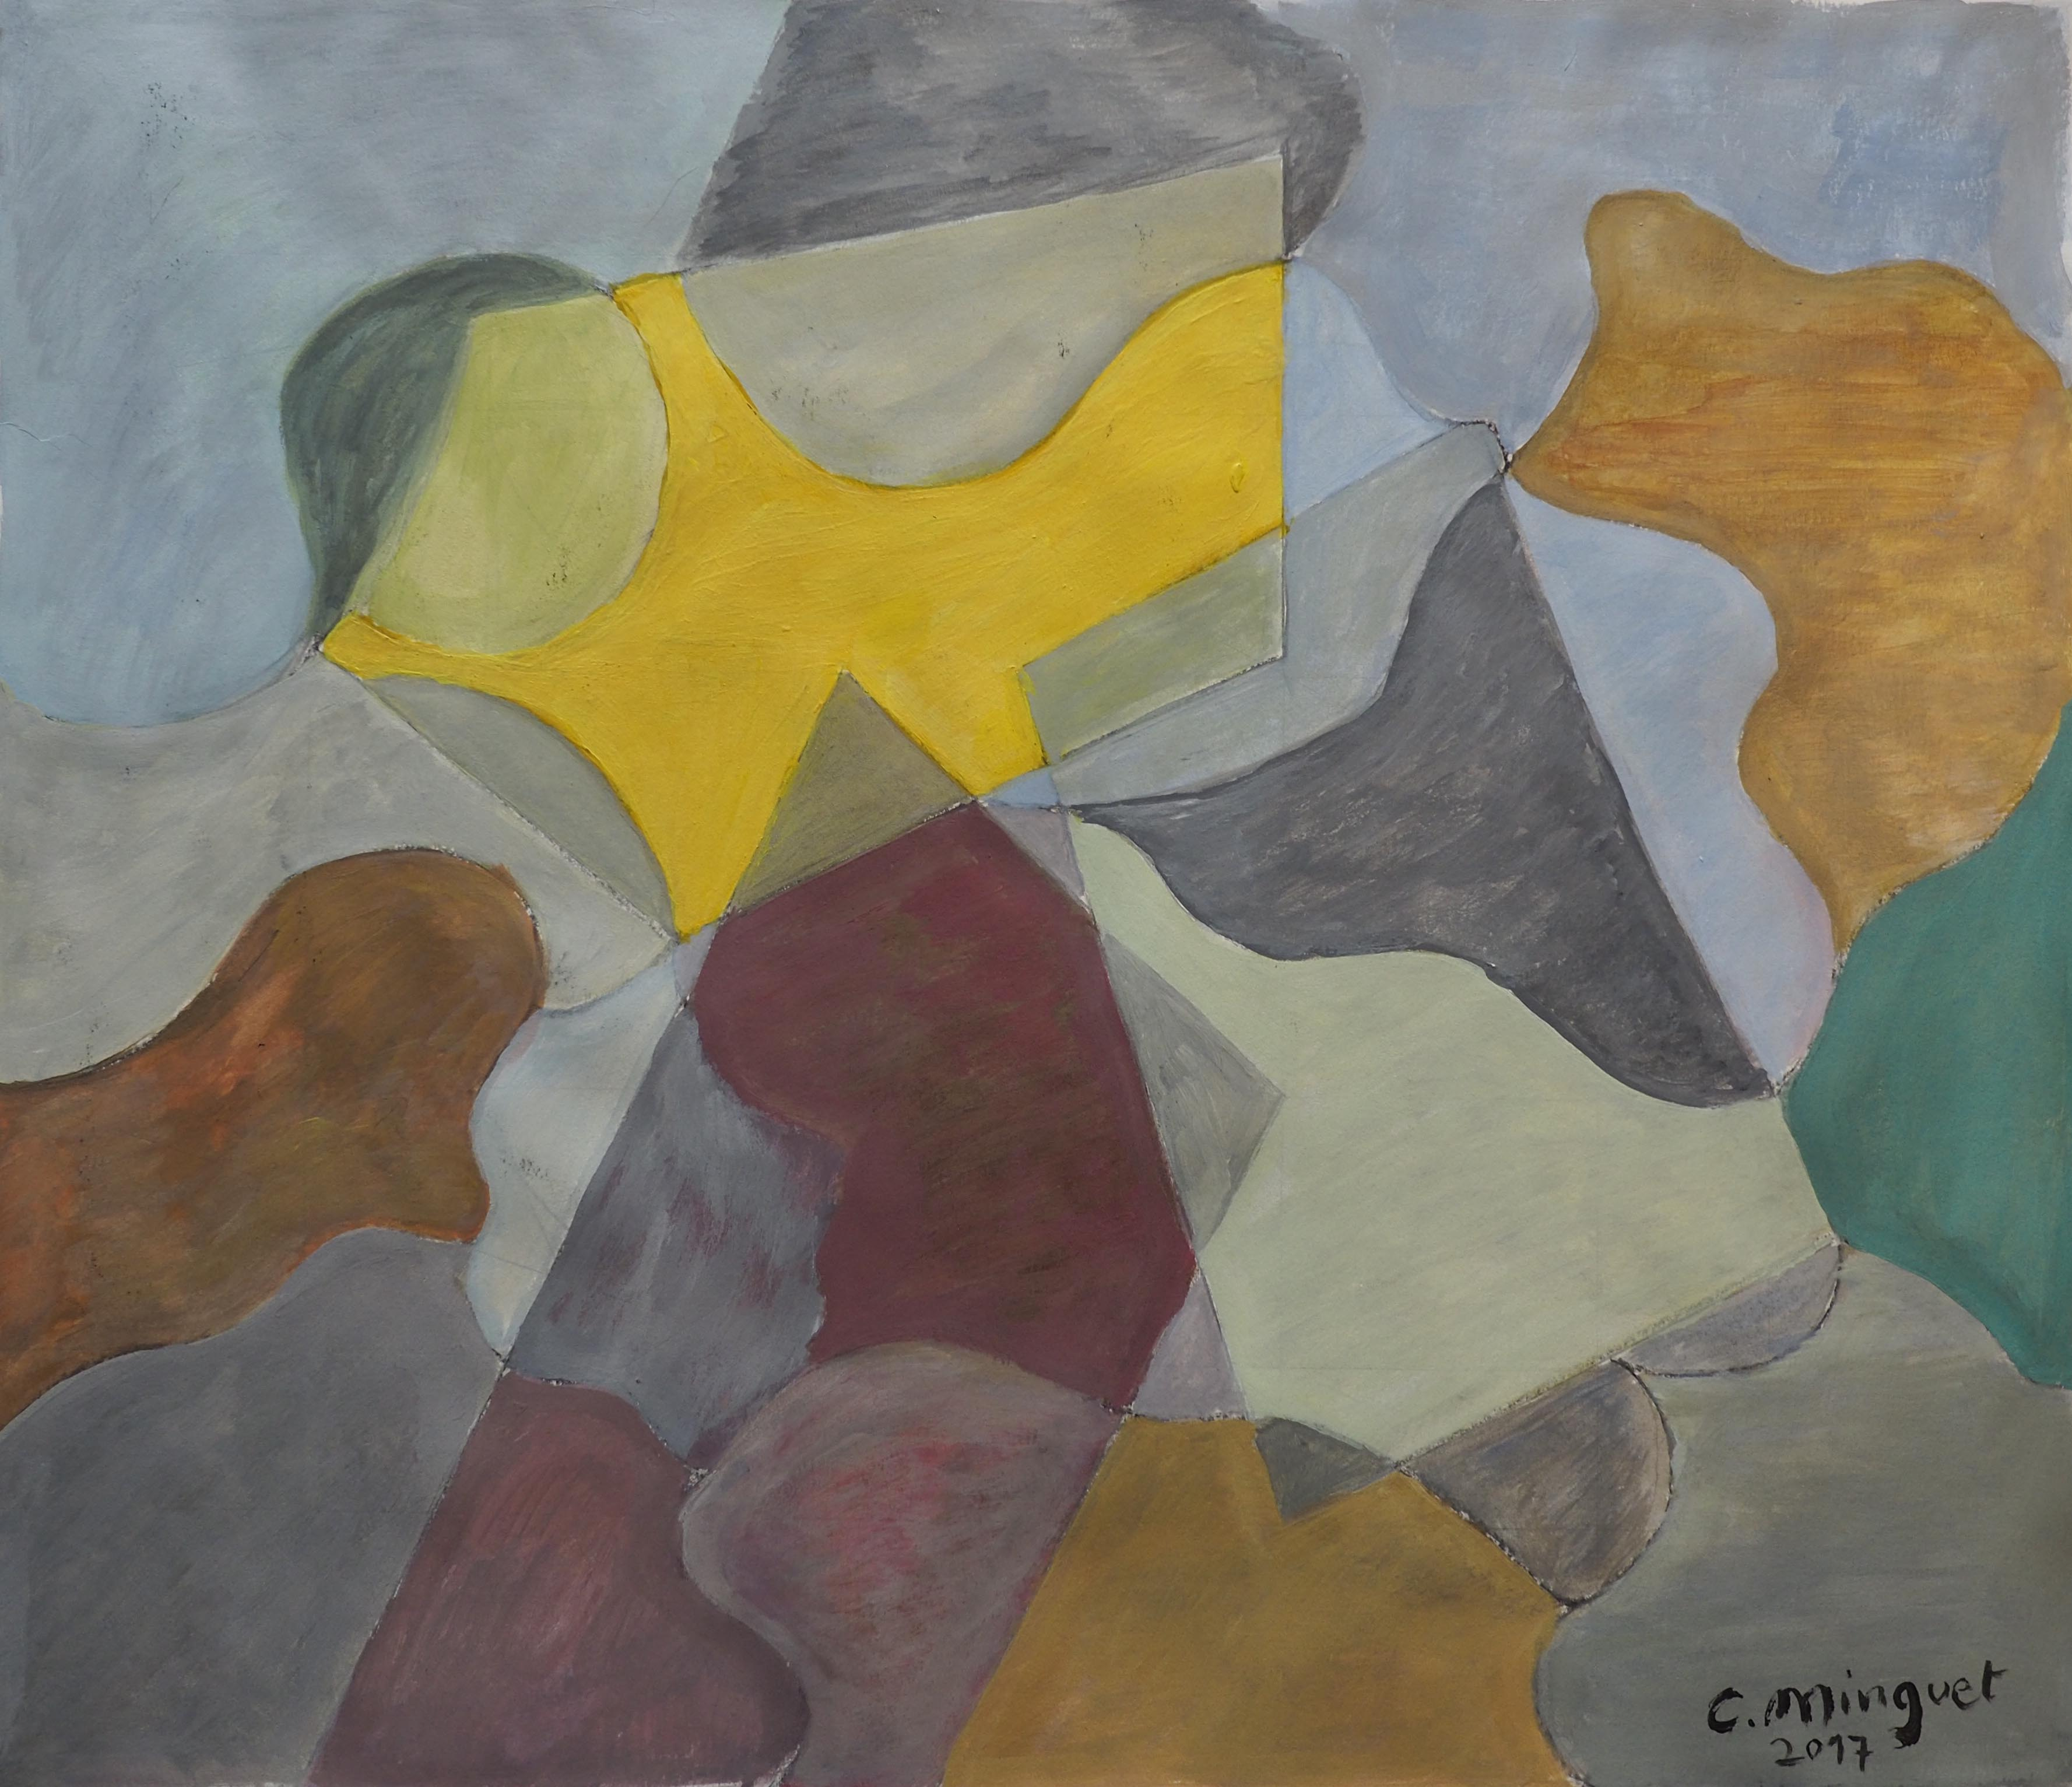 Christian Minguet, 36x41